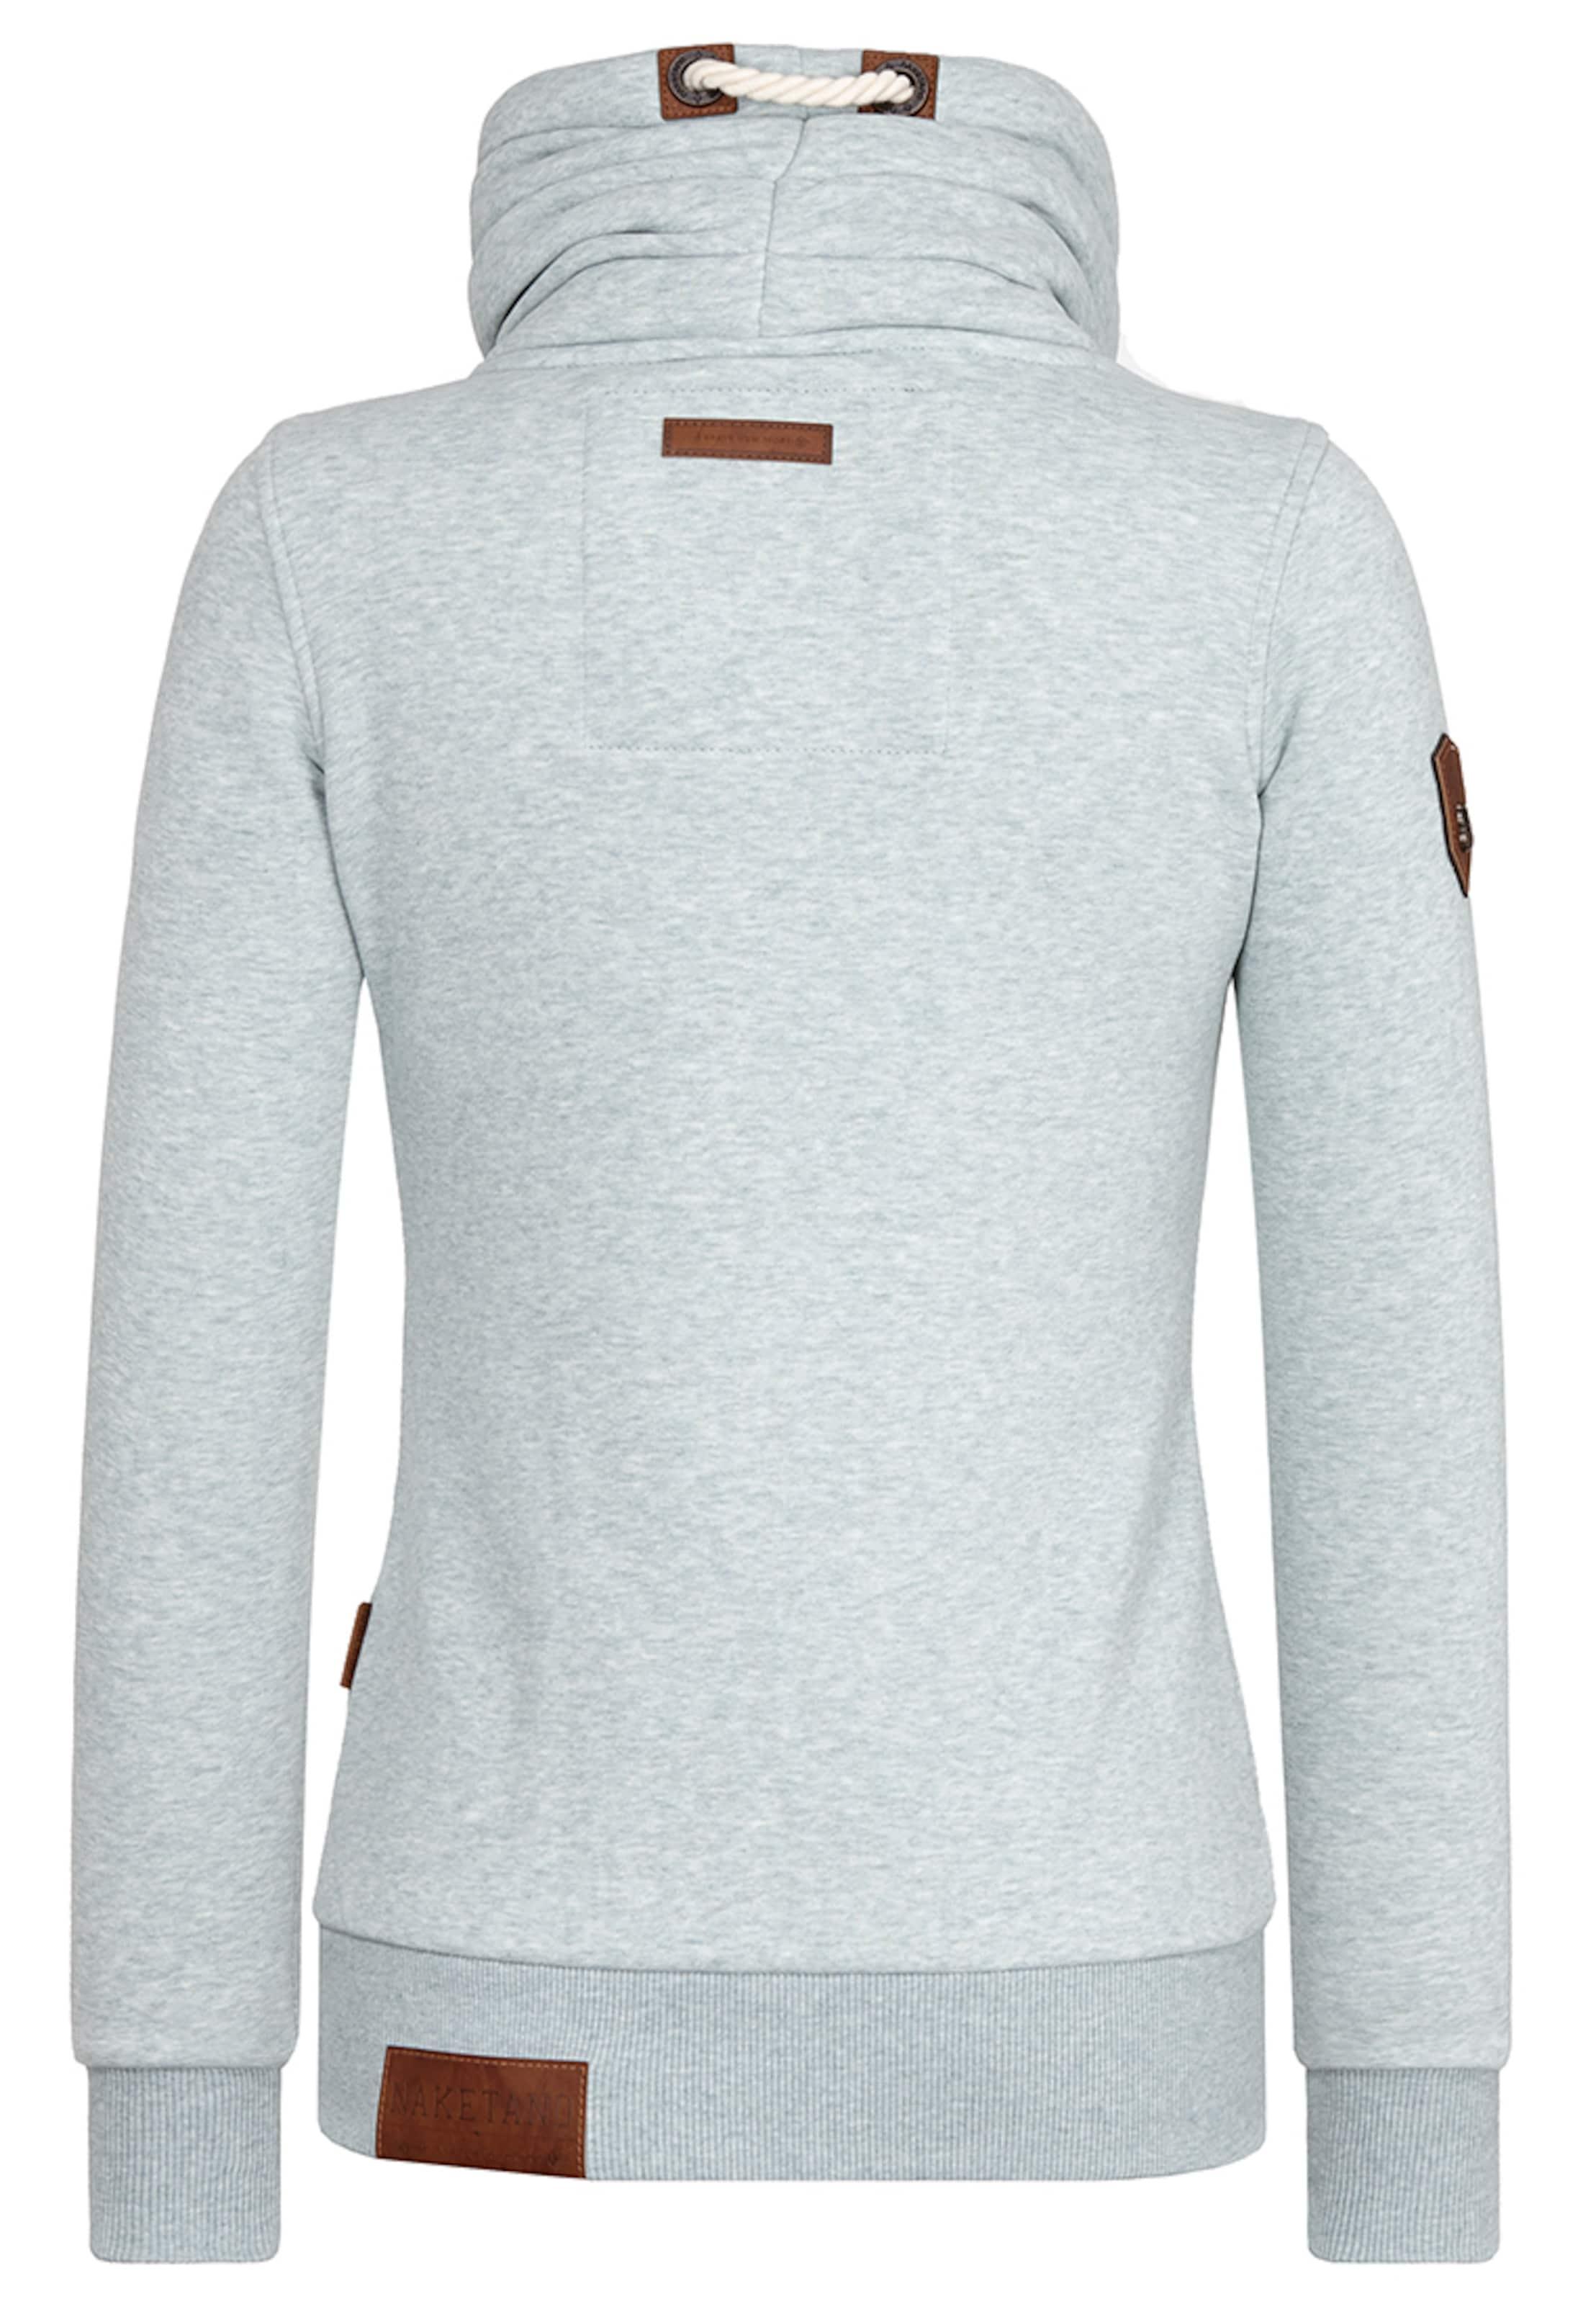 Freies Verschiffen Eastbay naketano Sweatjacke Aaa Qualität Verkauf In Mode iCwOIk